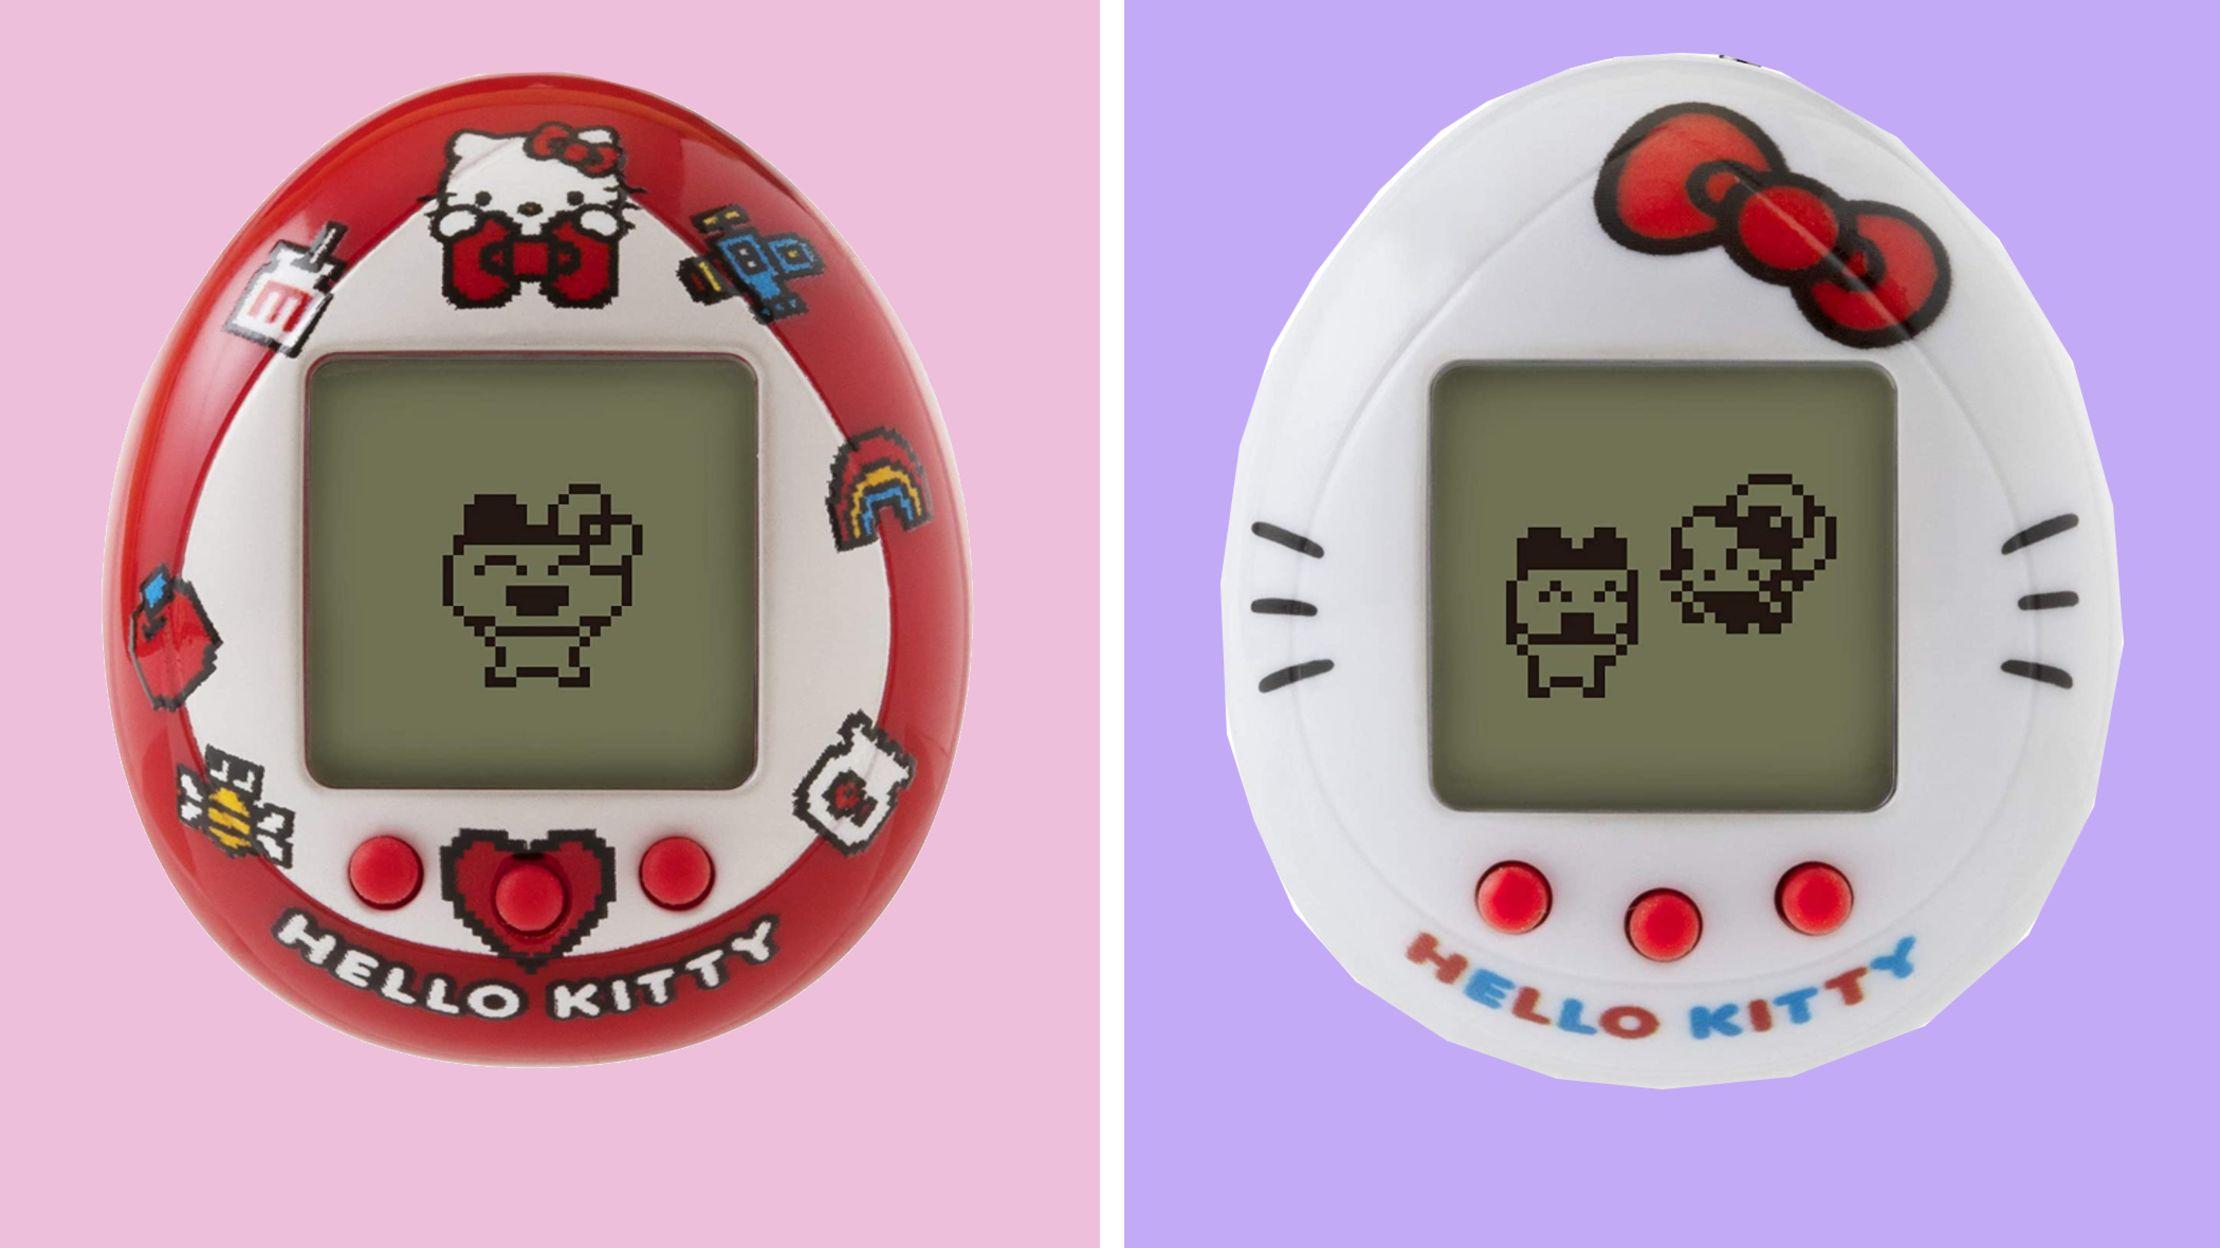 Feel Nostalgic With the New Hello Kitty-Themed Tamagotchi